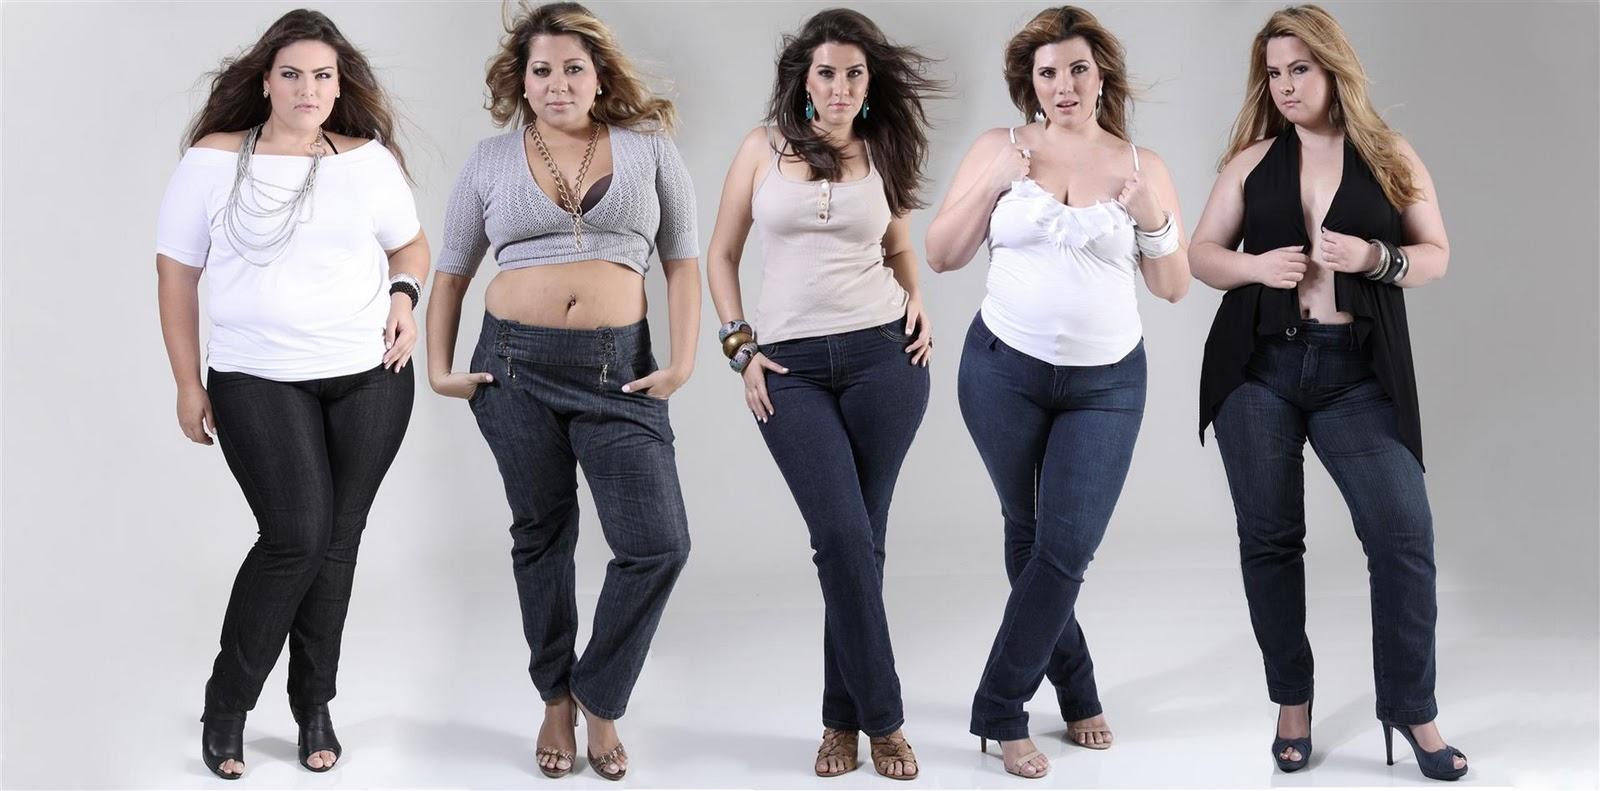 Толстушки в джинсах фото 2 фотография